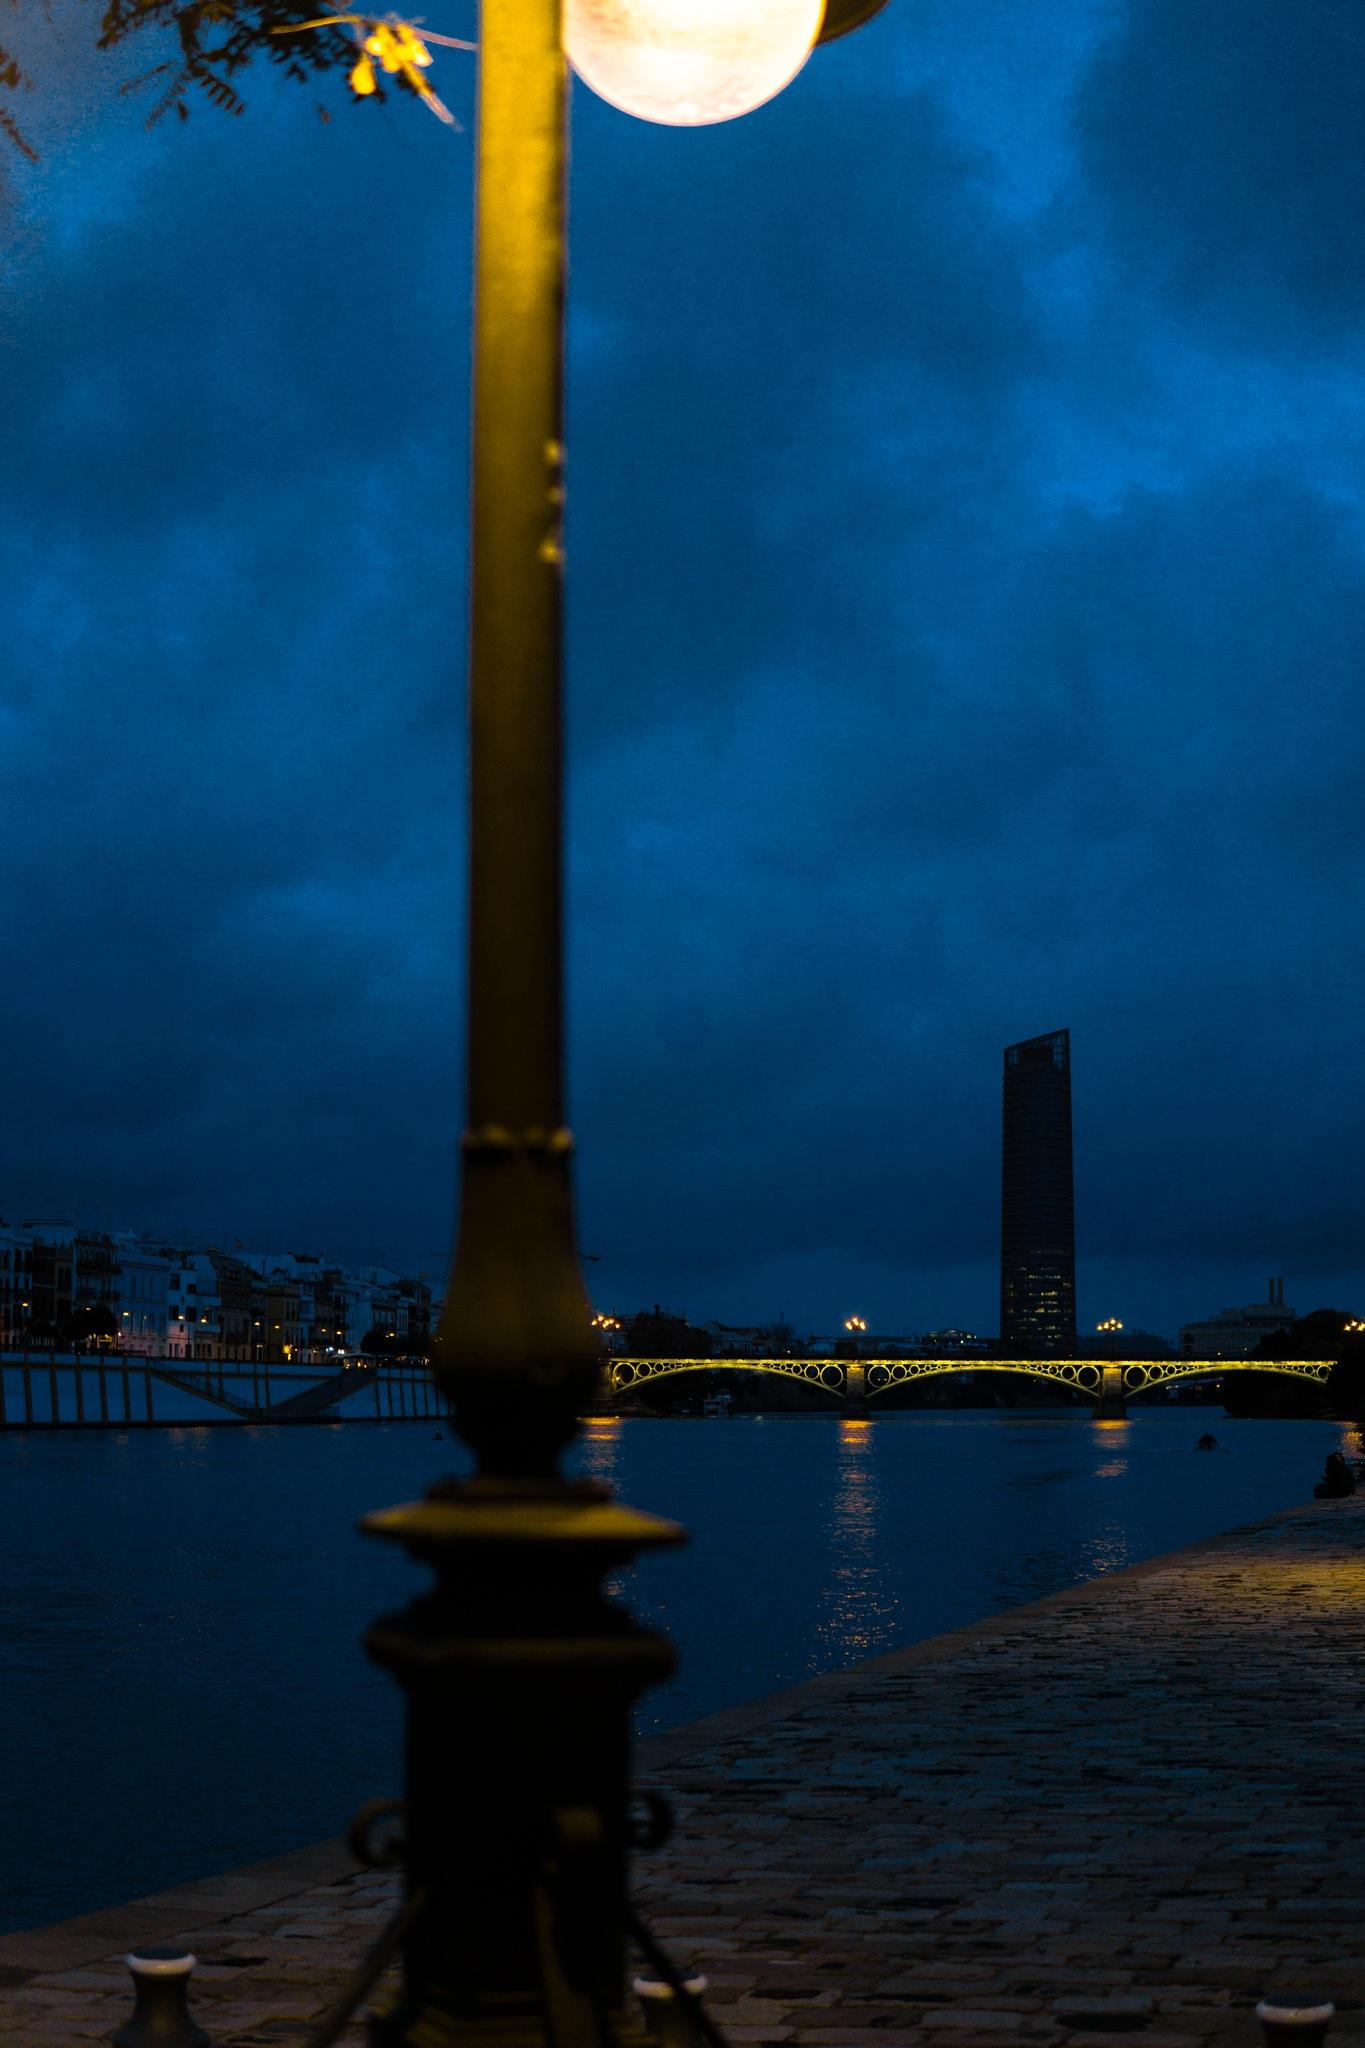 Waterfront. by Despreocupau